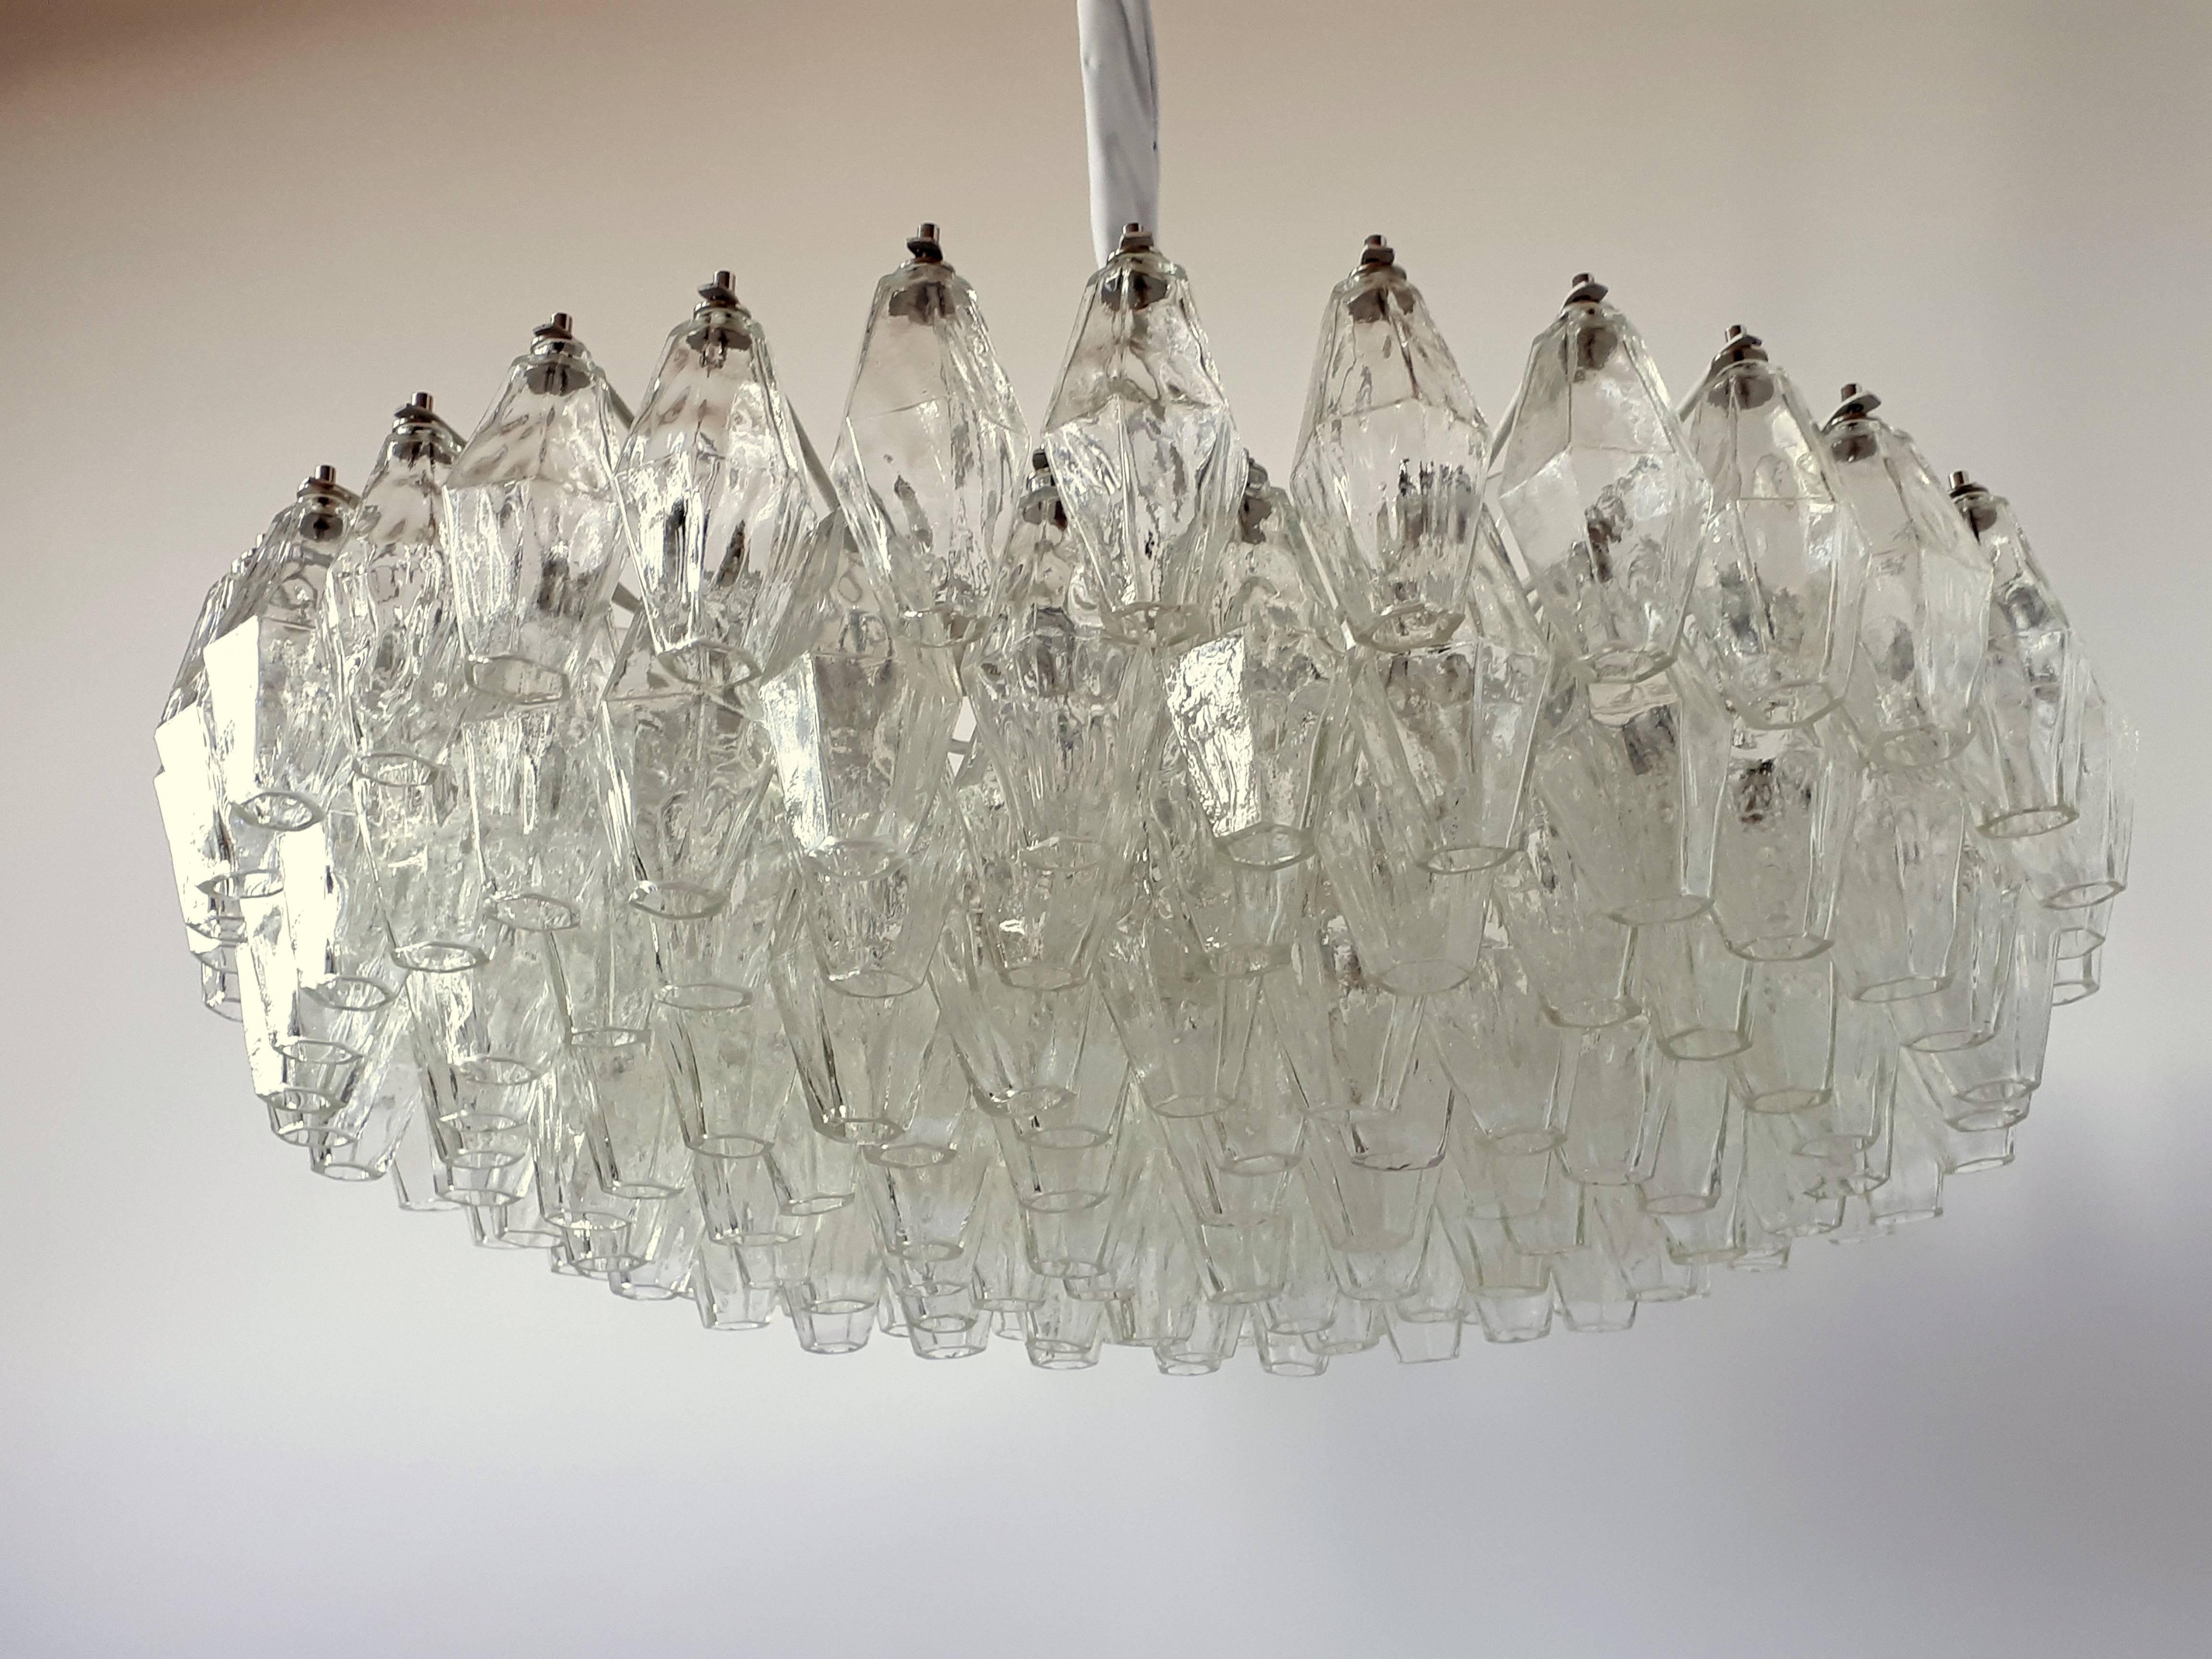 hero clear fray marc product murano jmf jean chandelier glass